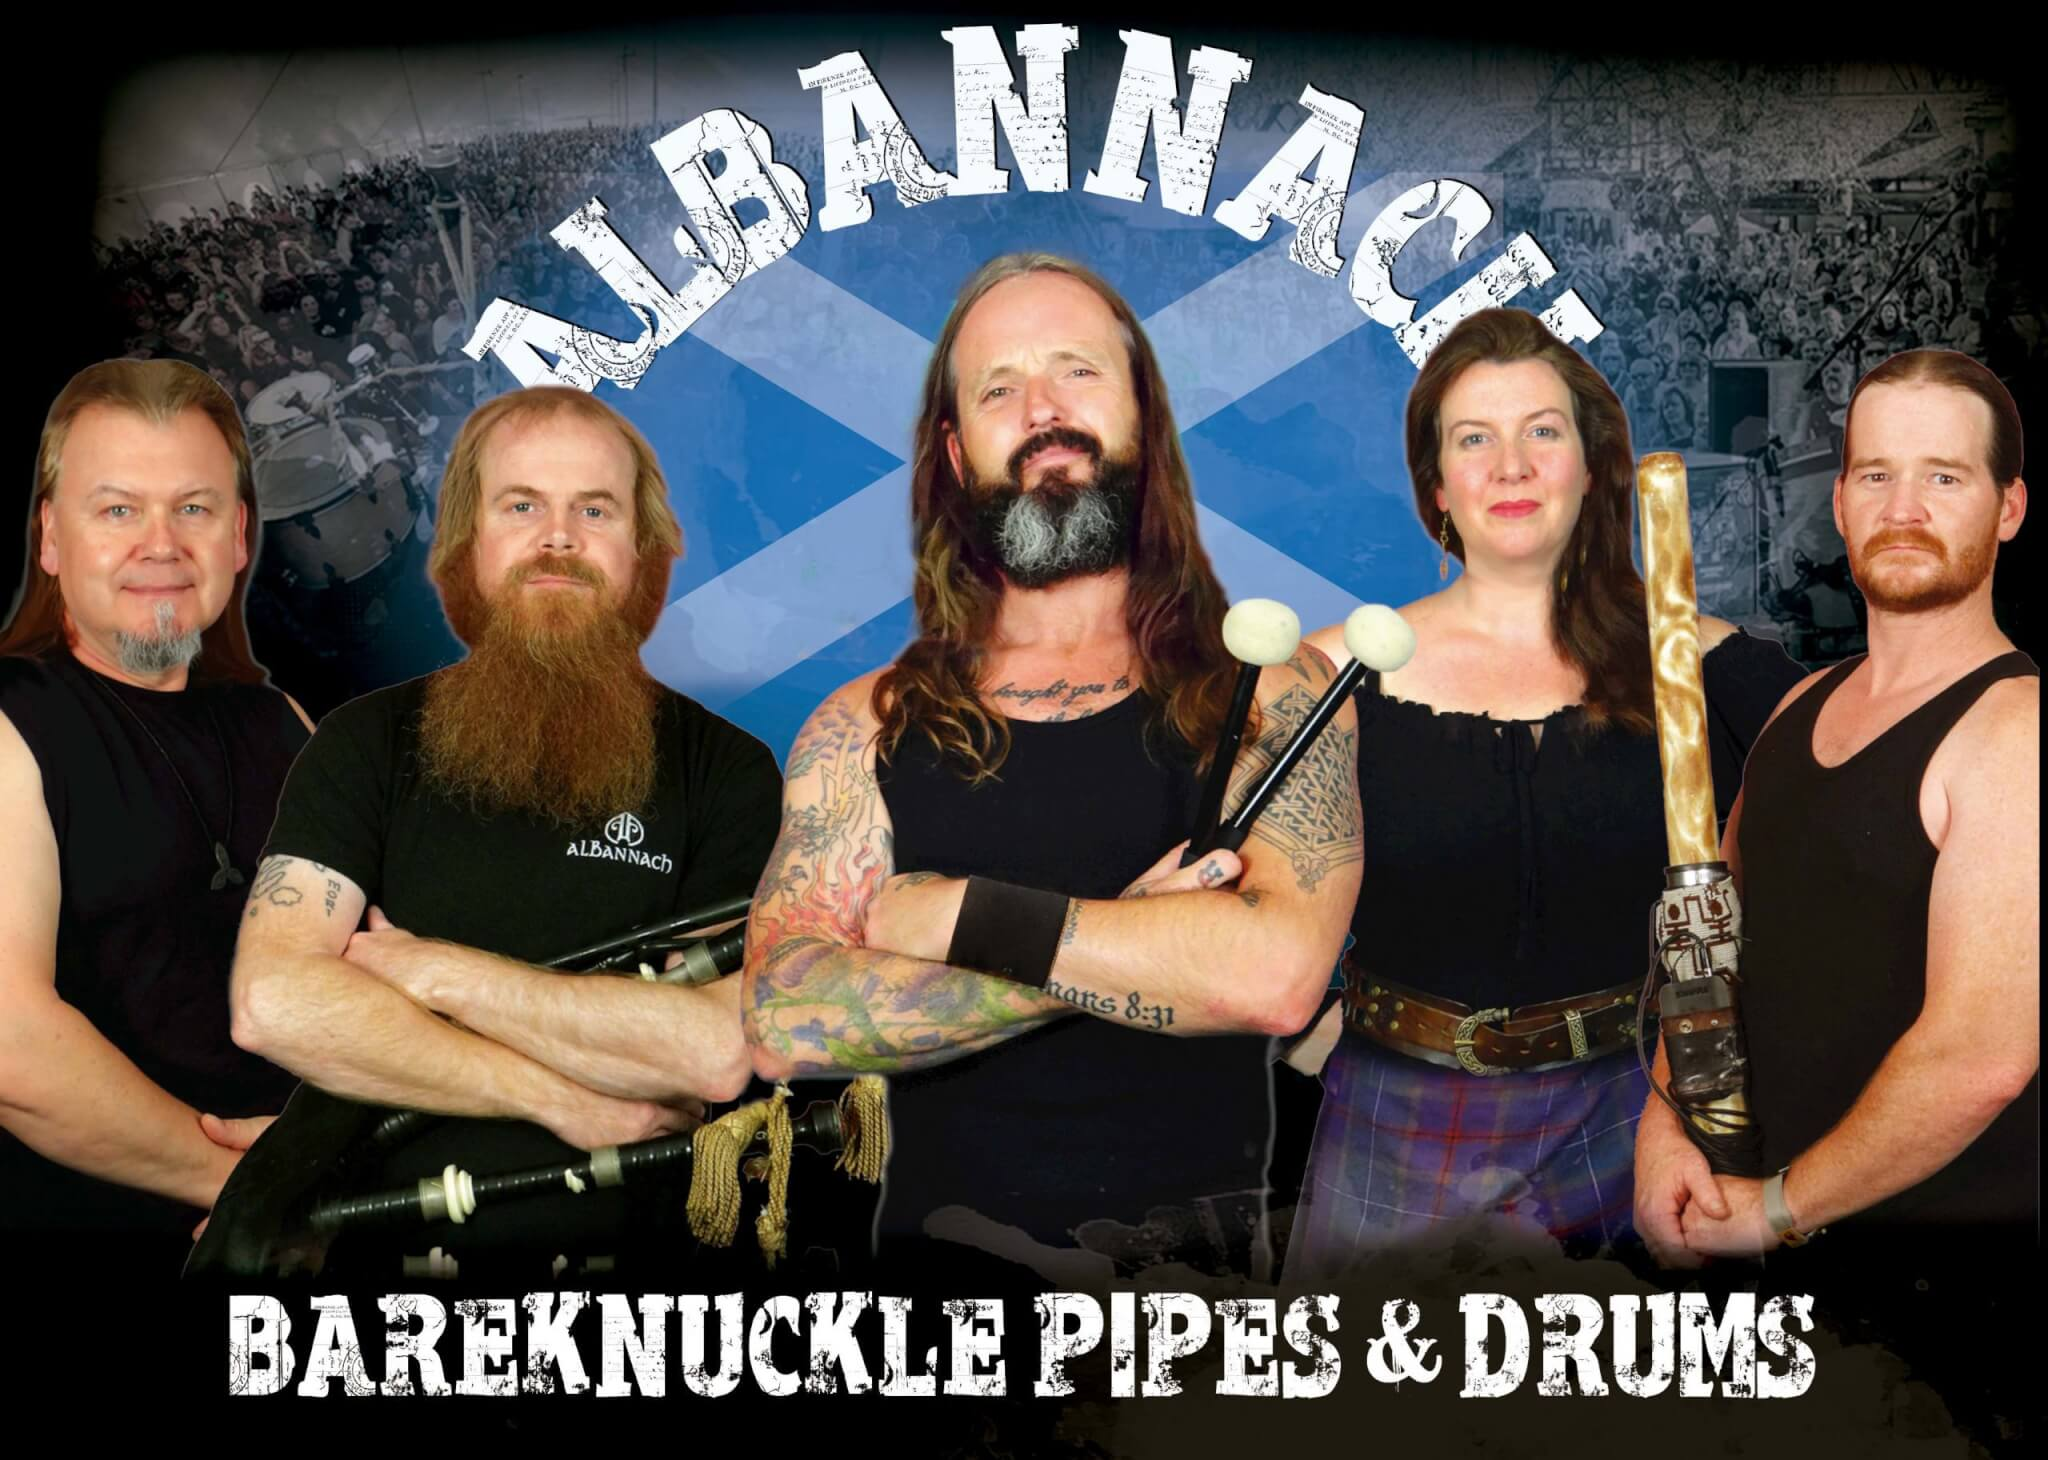 Albannach Bareknuckle Pipes & Drums band